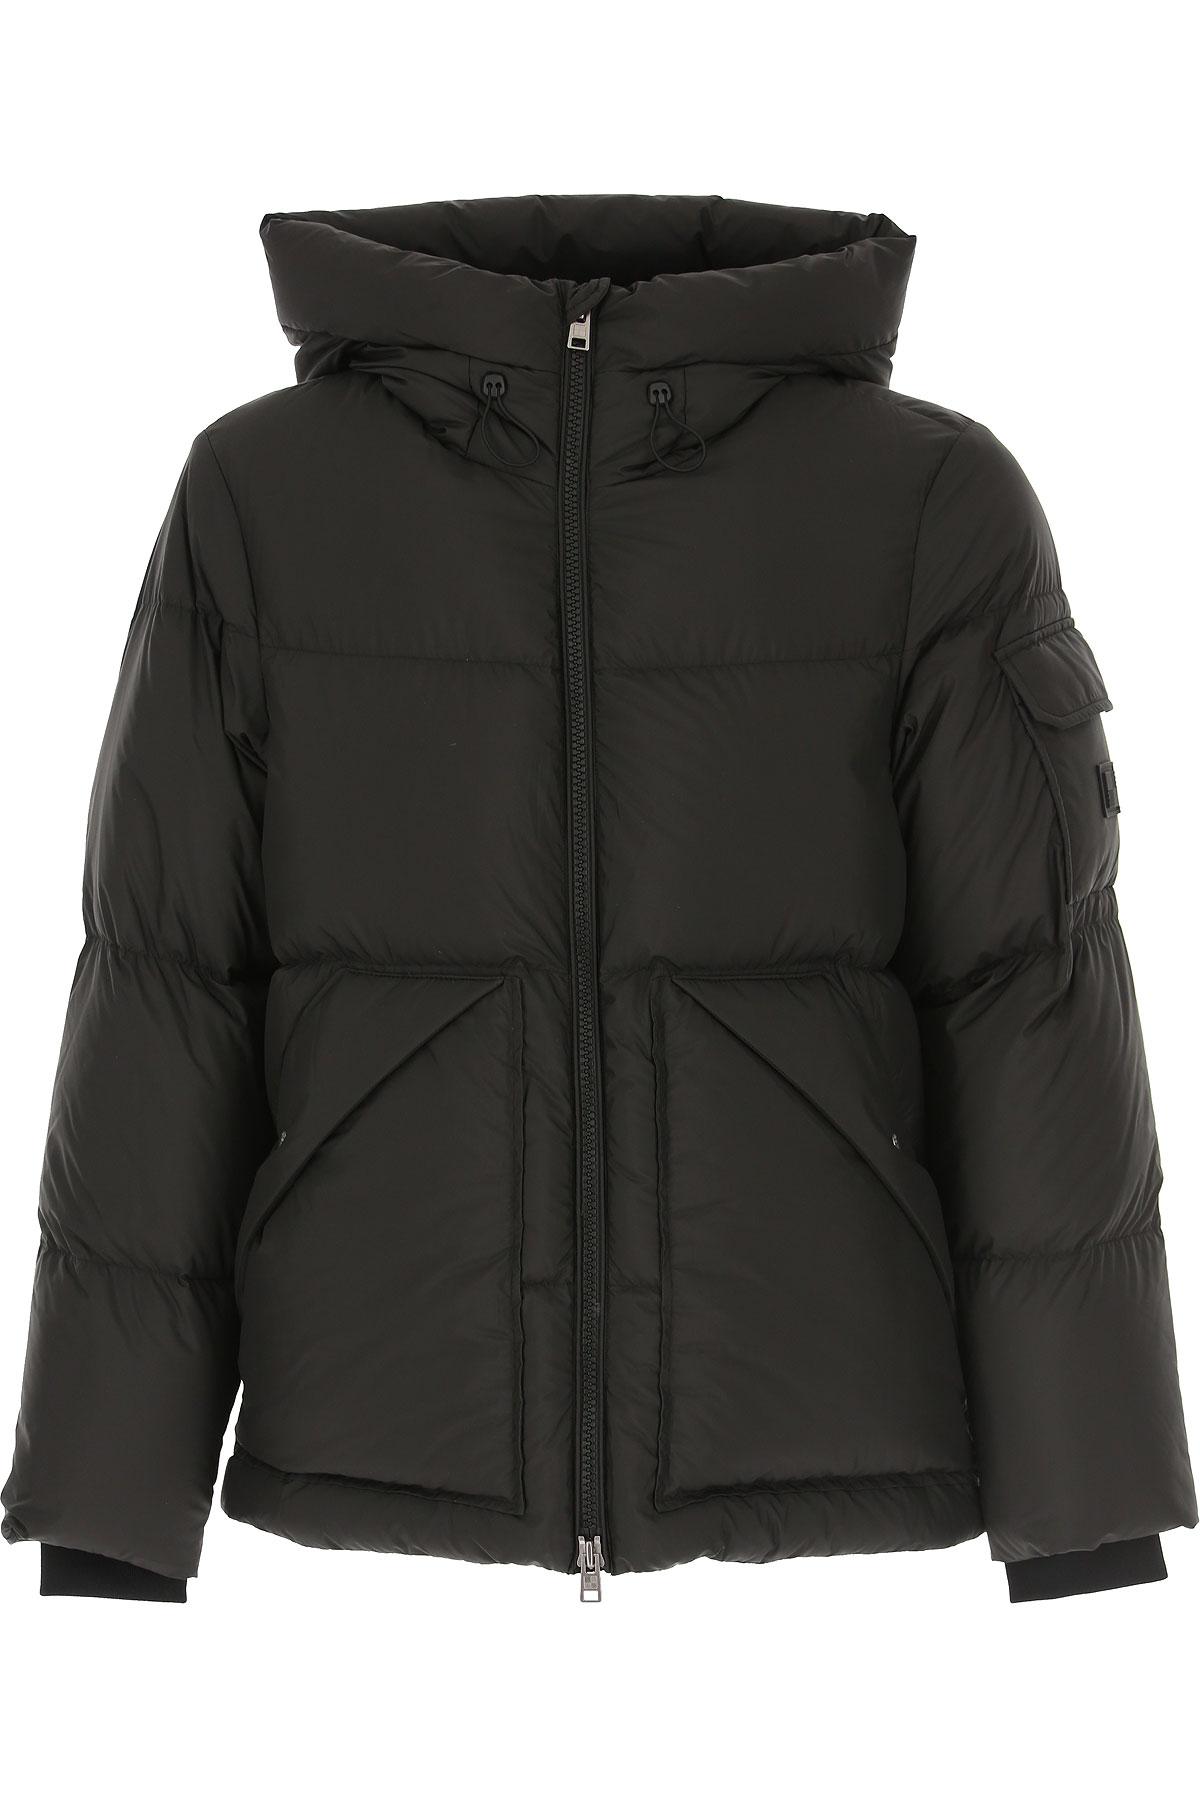 Woolrich Down Jacket for Men, Puffer Ski Jacket On Sale, Black, Duck Down, 2019, L S XL